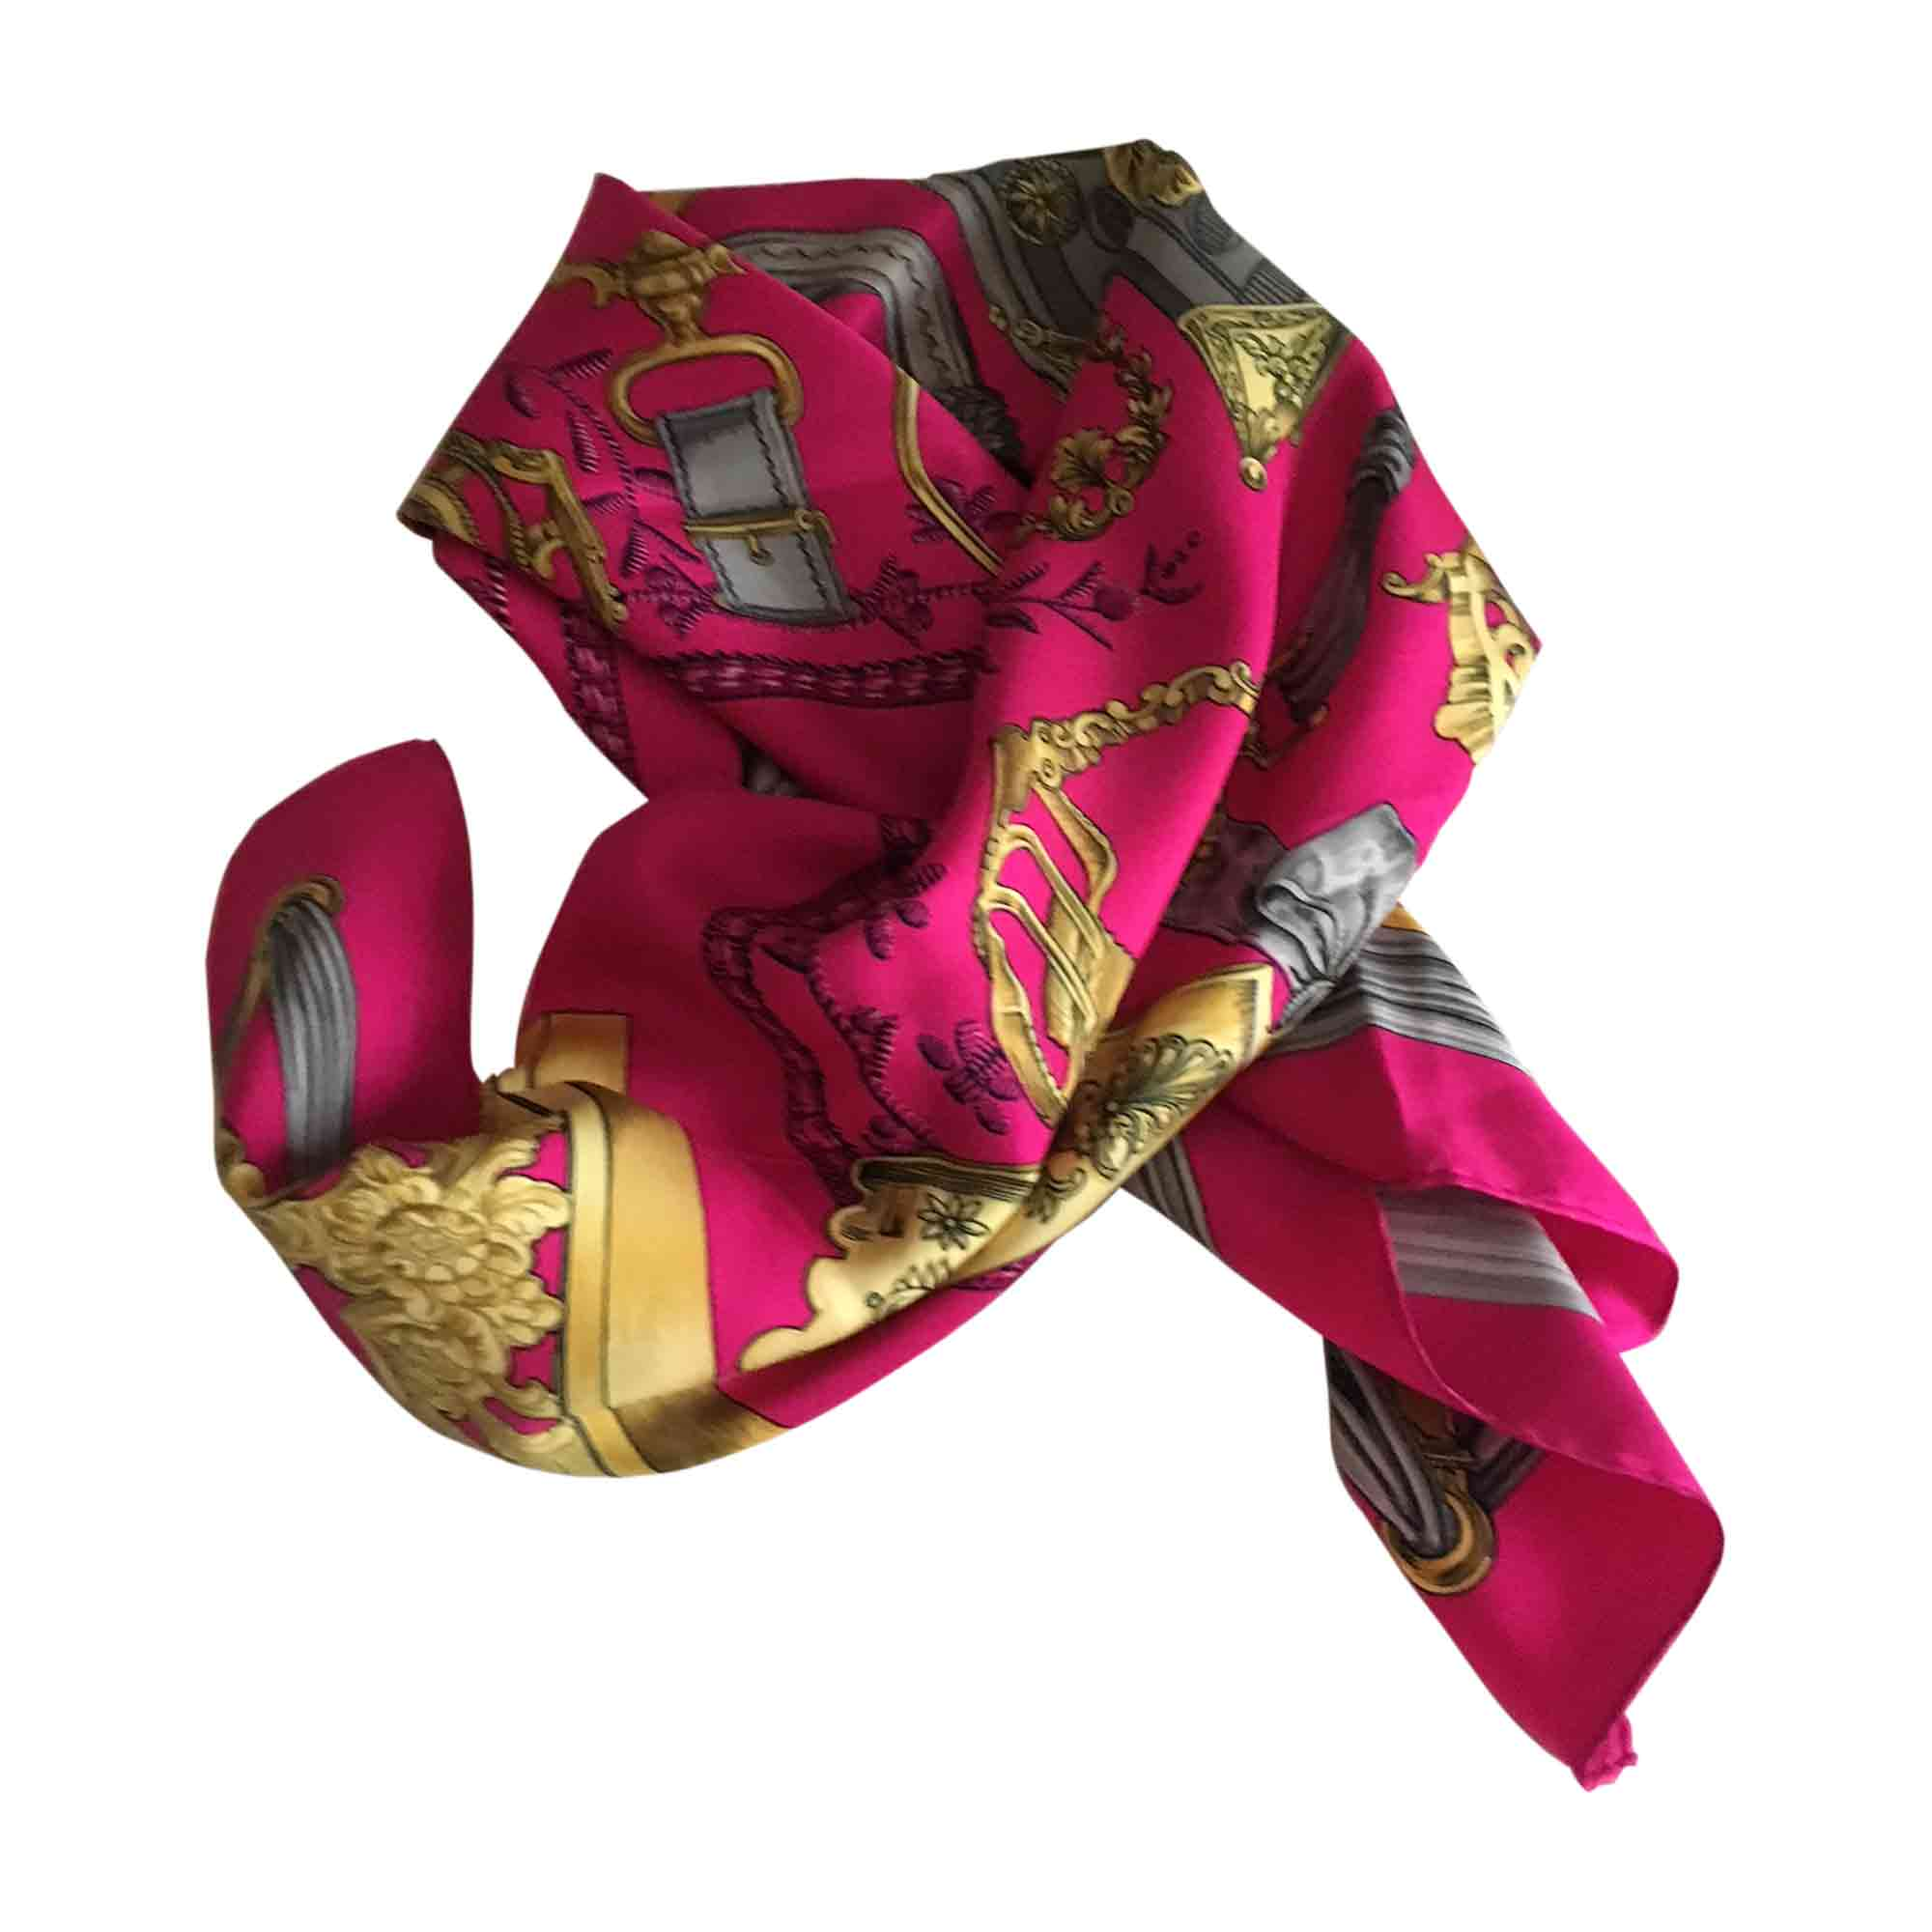 8a94edb9c611 Foulard HERMÈS rose vendu par Betty 18217472 - 7182613